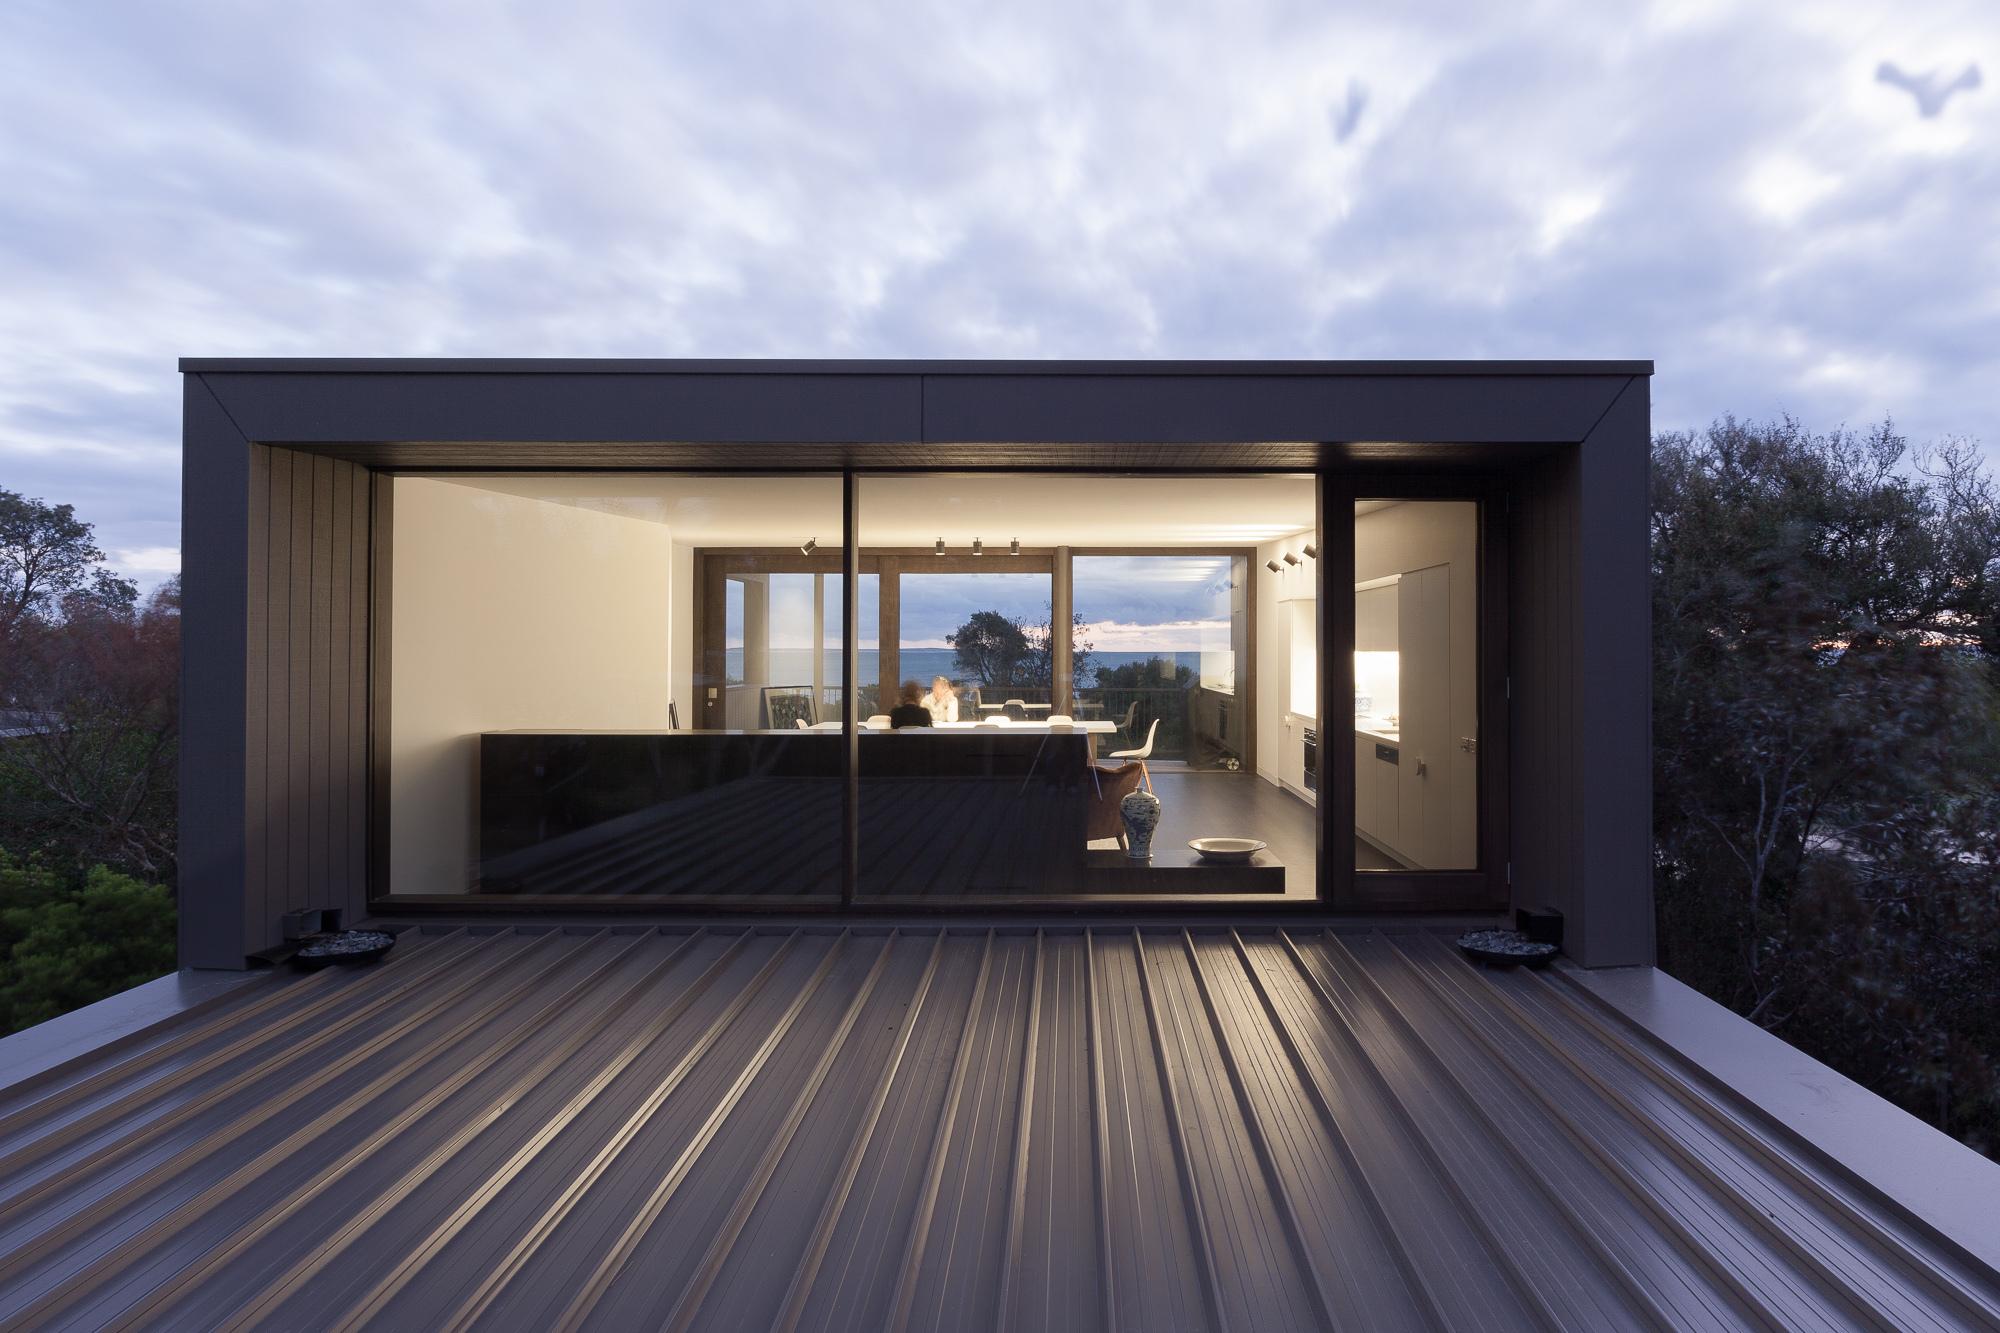 Gallery of residence j c open studio pty ltd 5 for Architecture design studio pty ltd